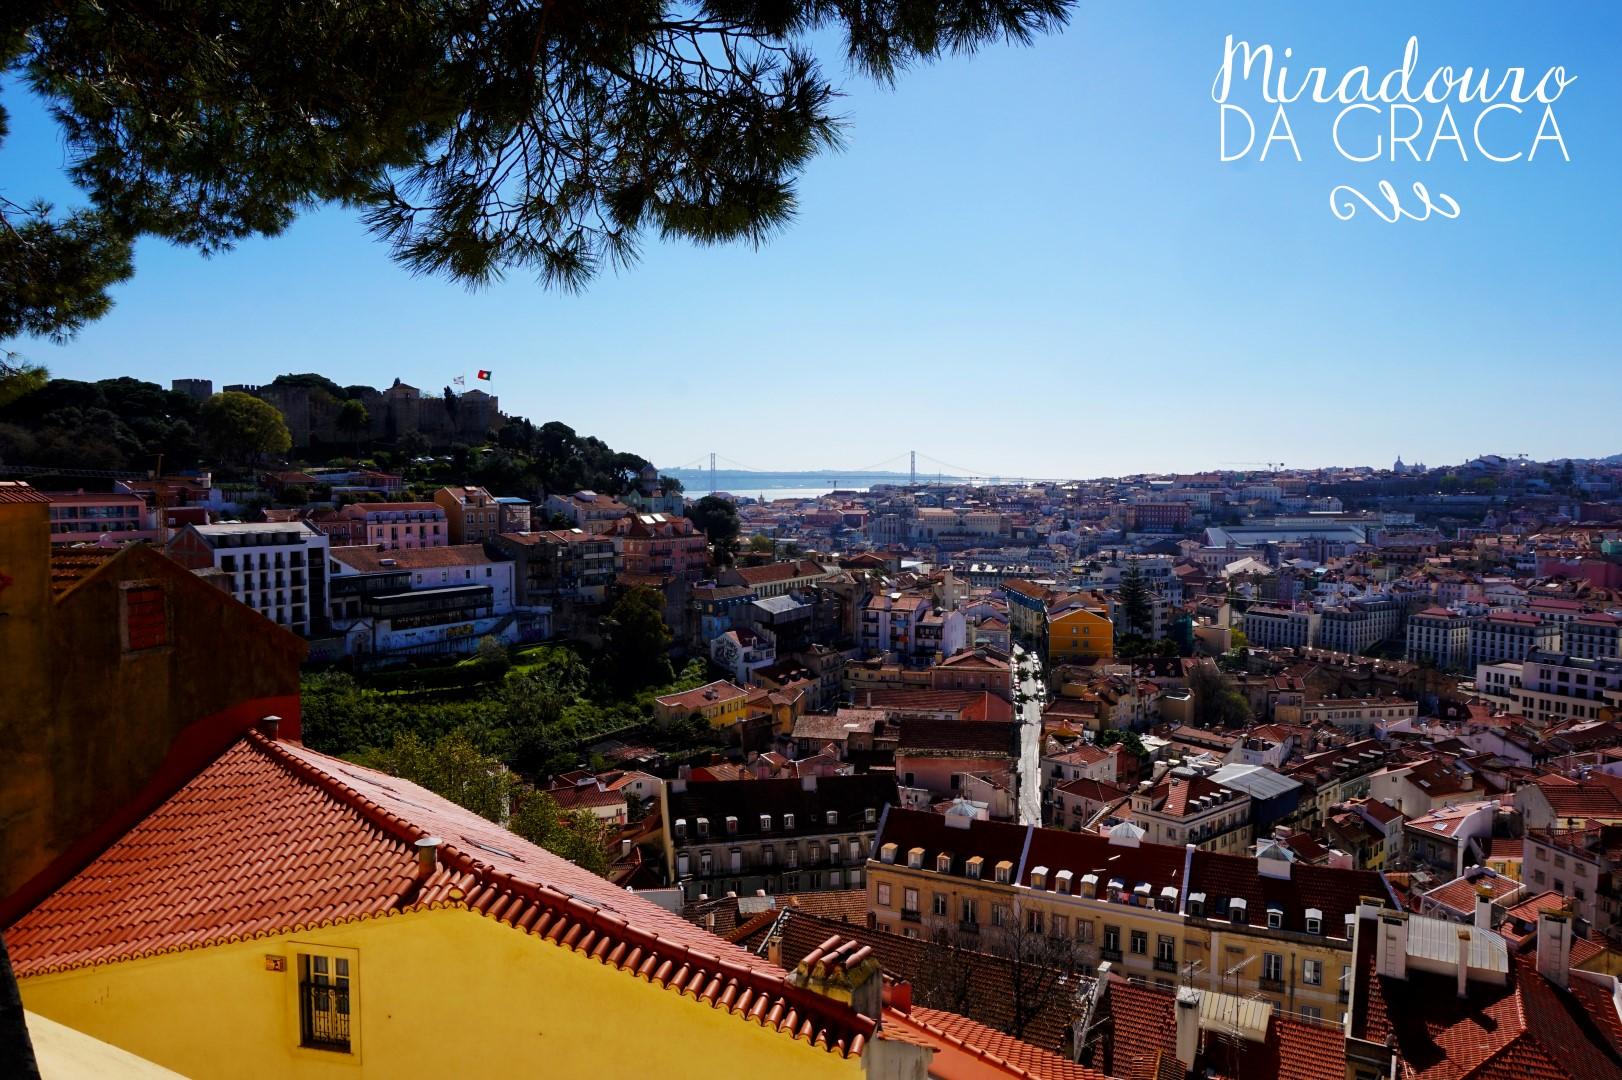 Lisbonne - Miradouro de Graça